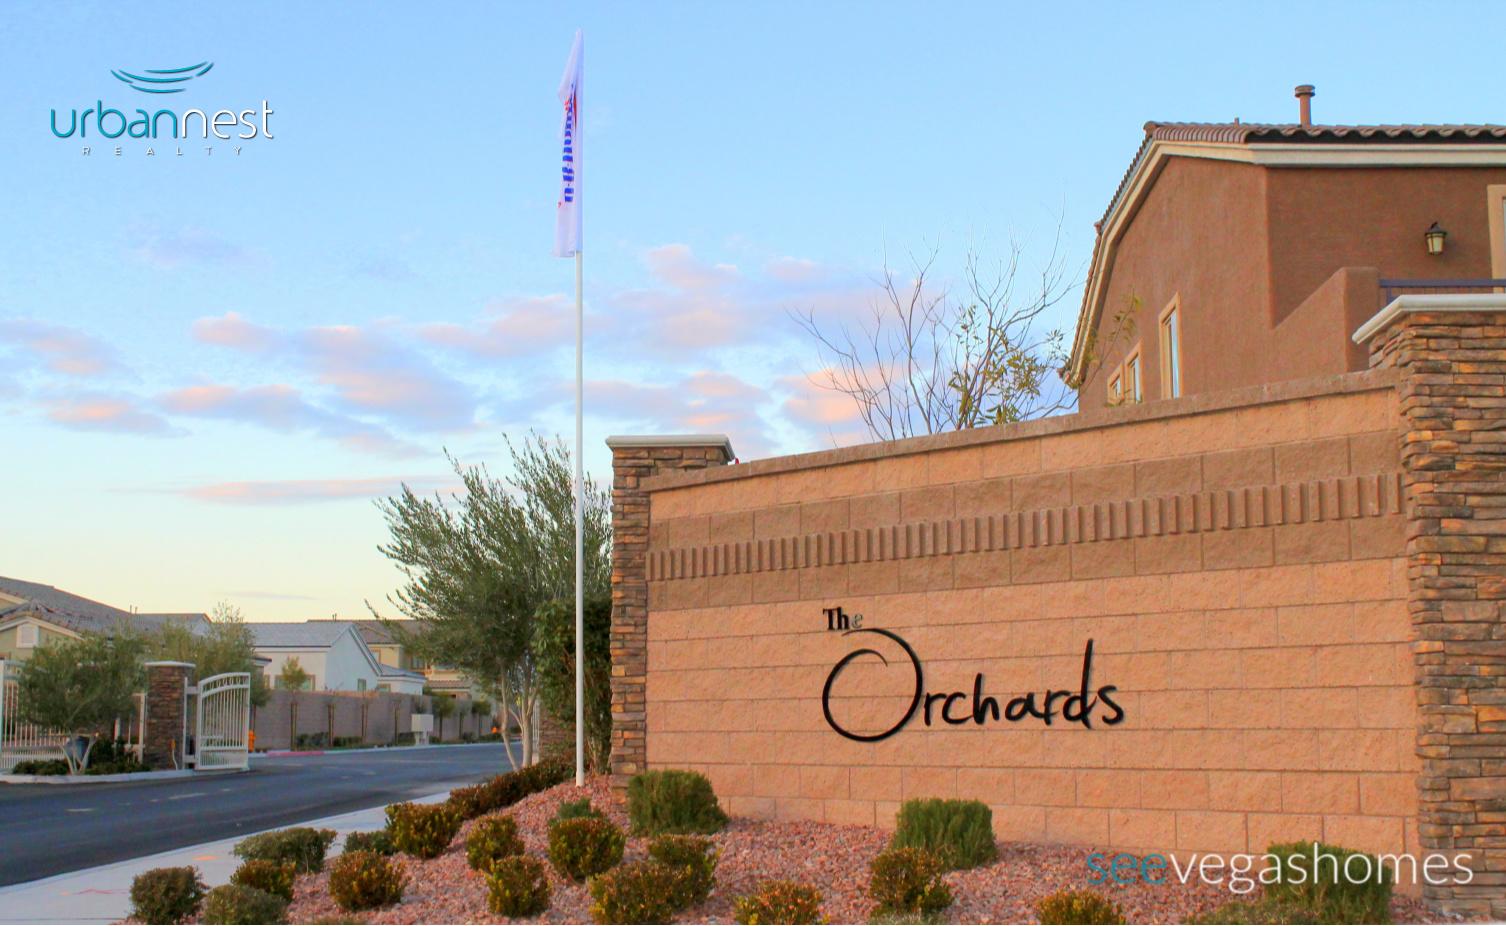 The_Orchards_Las_Vegas_NV_89131_SeeVegasHomes